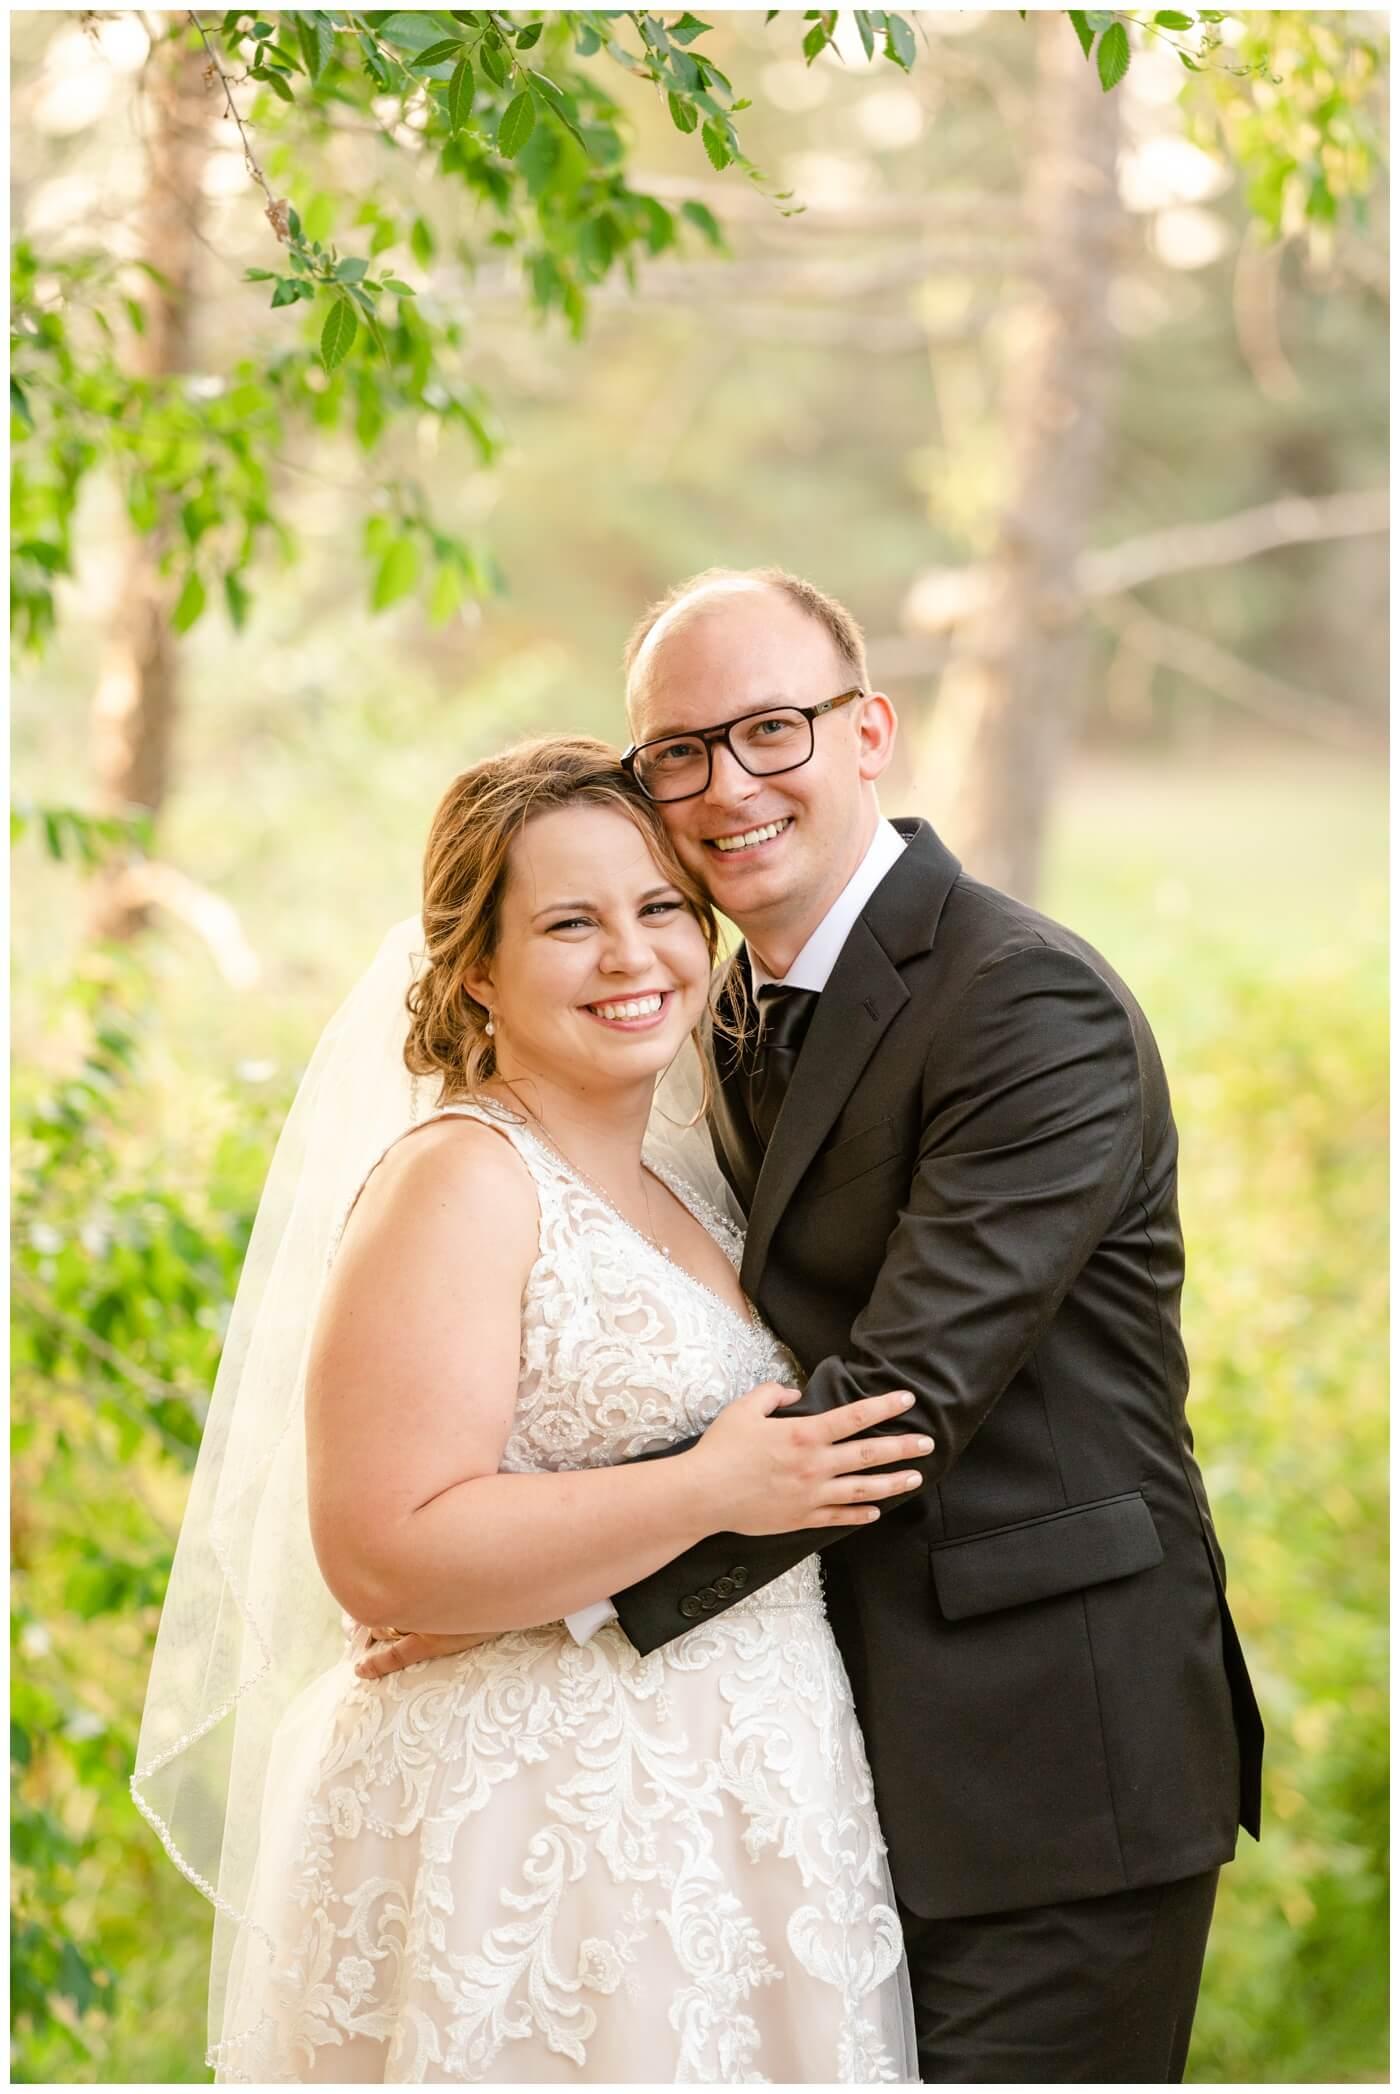 Colter & Jillyan - Encore Wedding Session - 02 - Happy Wedding Couple